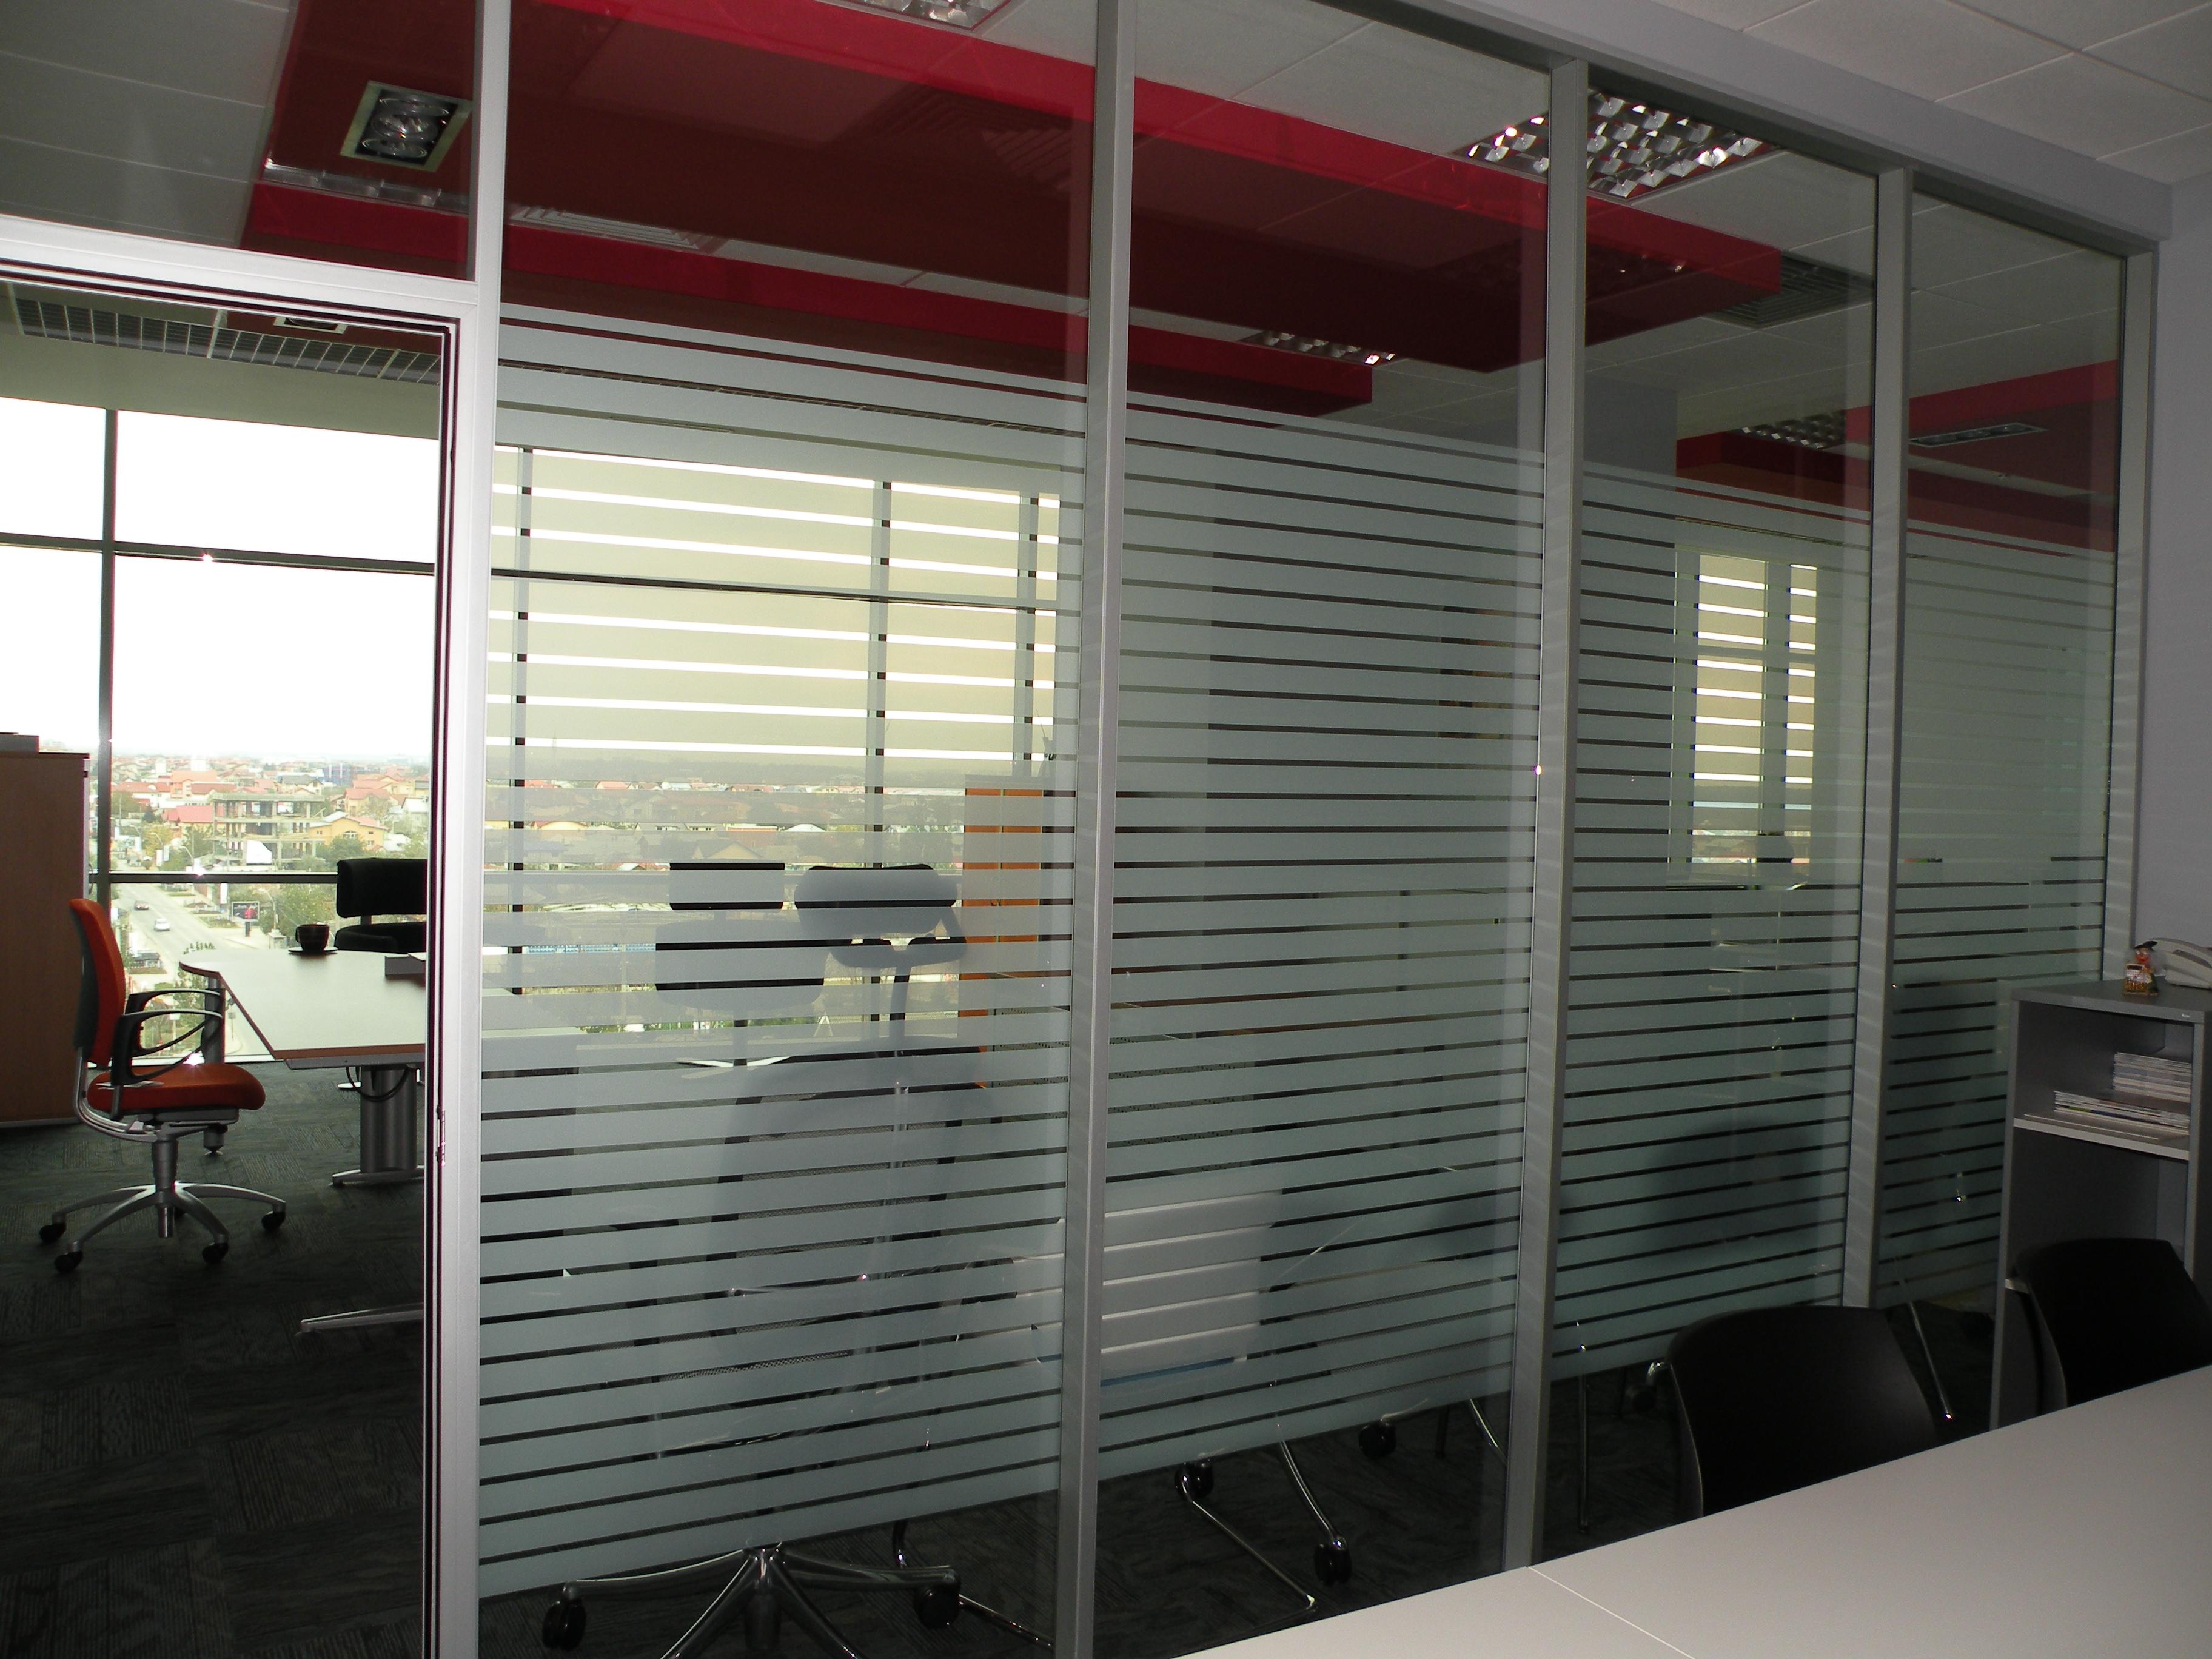 Pereti modulari din sticla, demontabili CLIPS - Poza 20